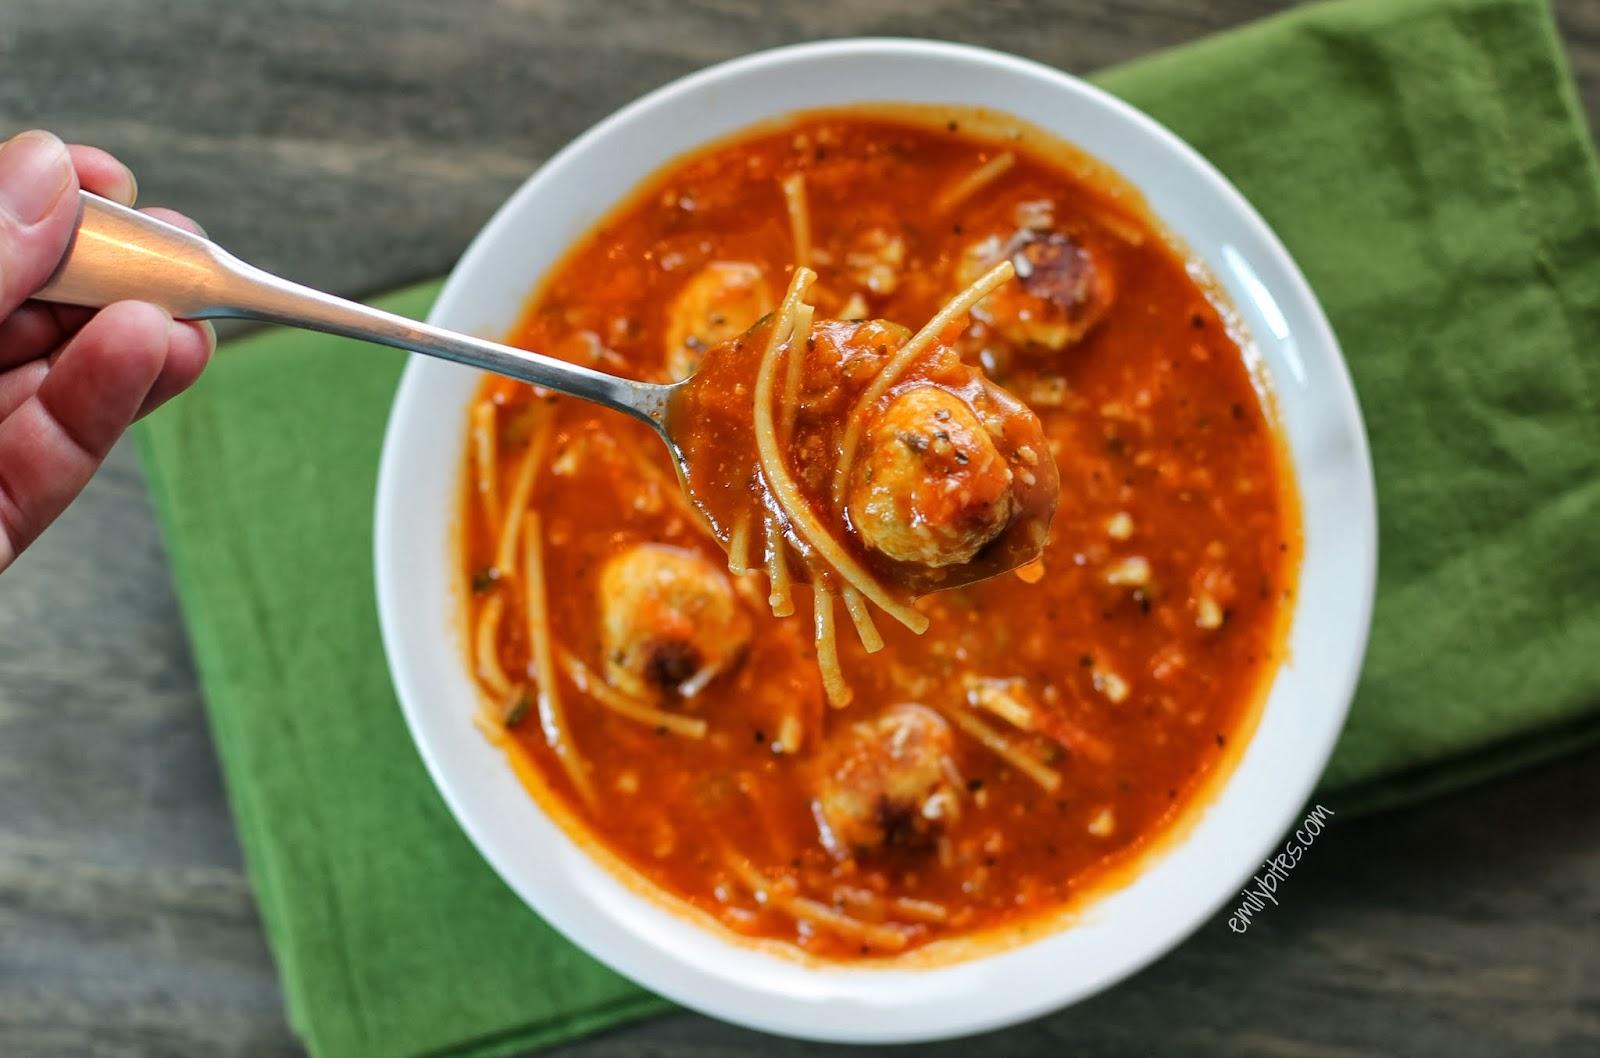 Spaghetti+%26+Meatball+Soup+10b.jpg